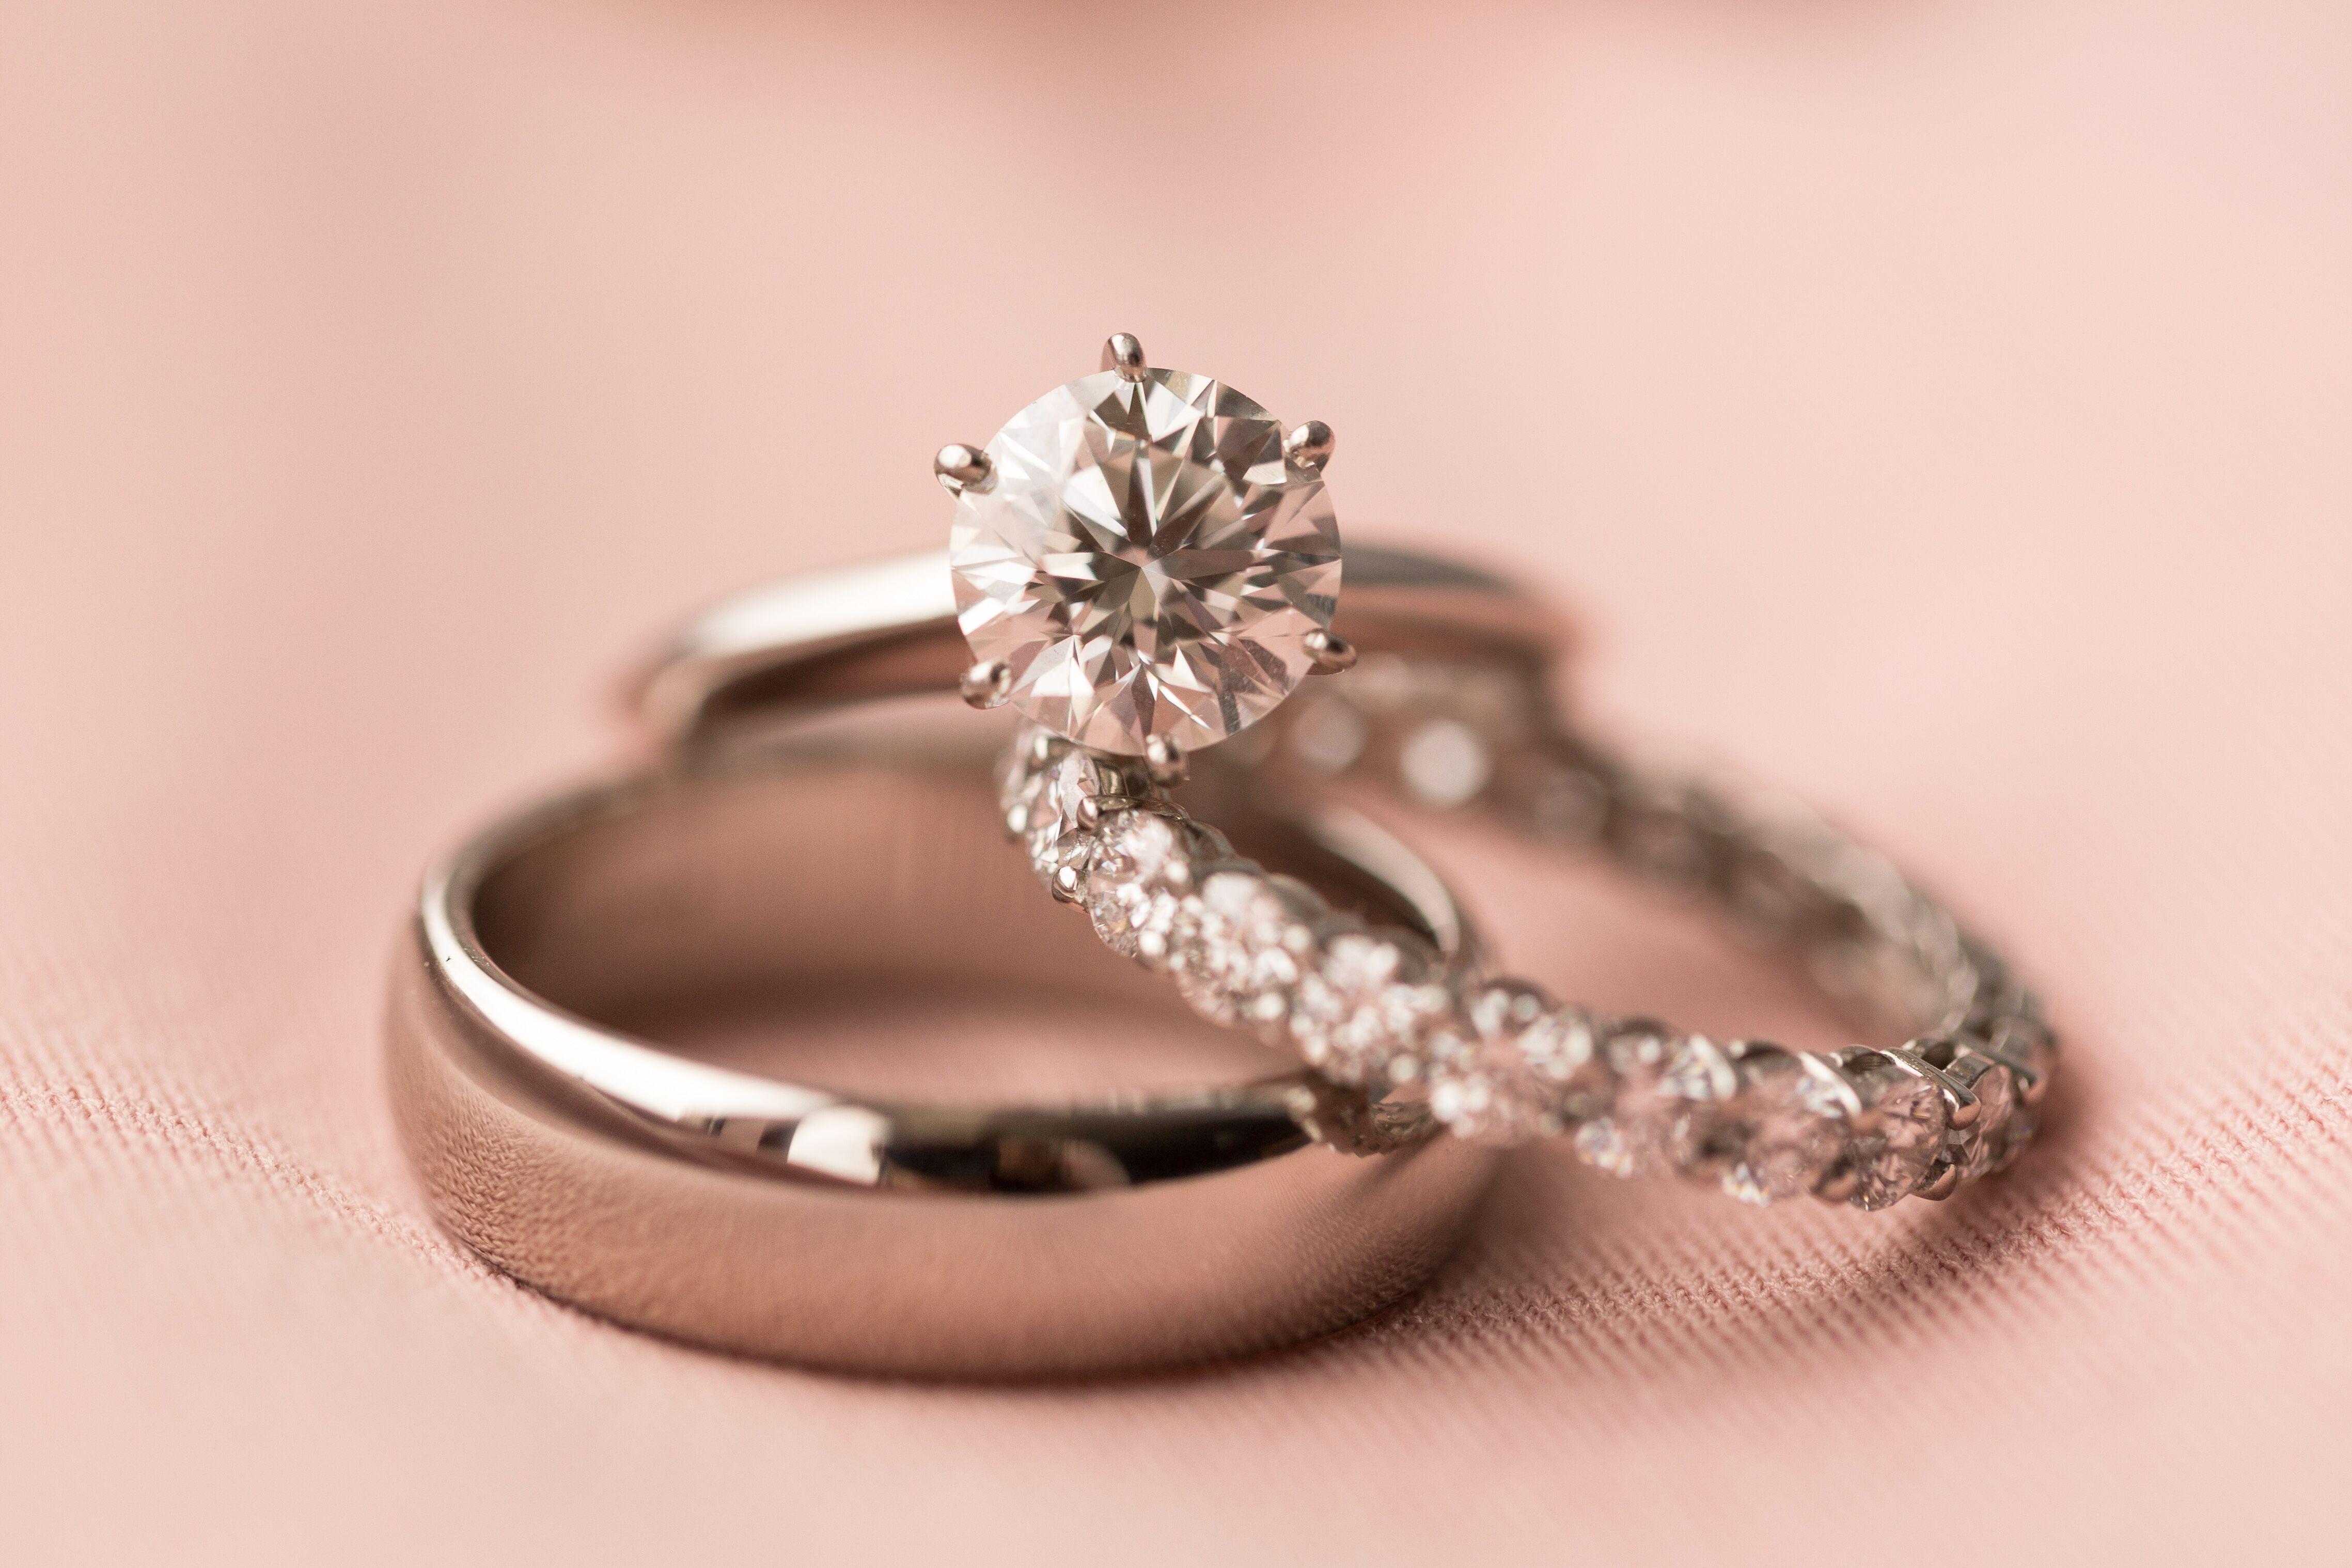 Tiffany Round-Cut Diamond Ring